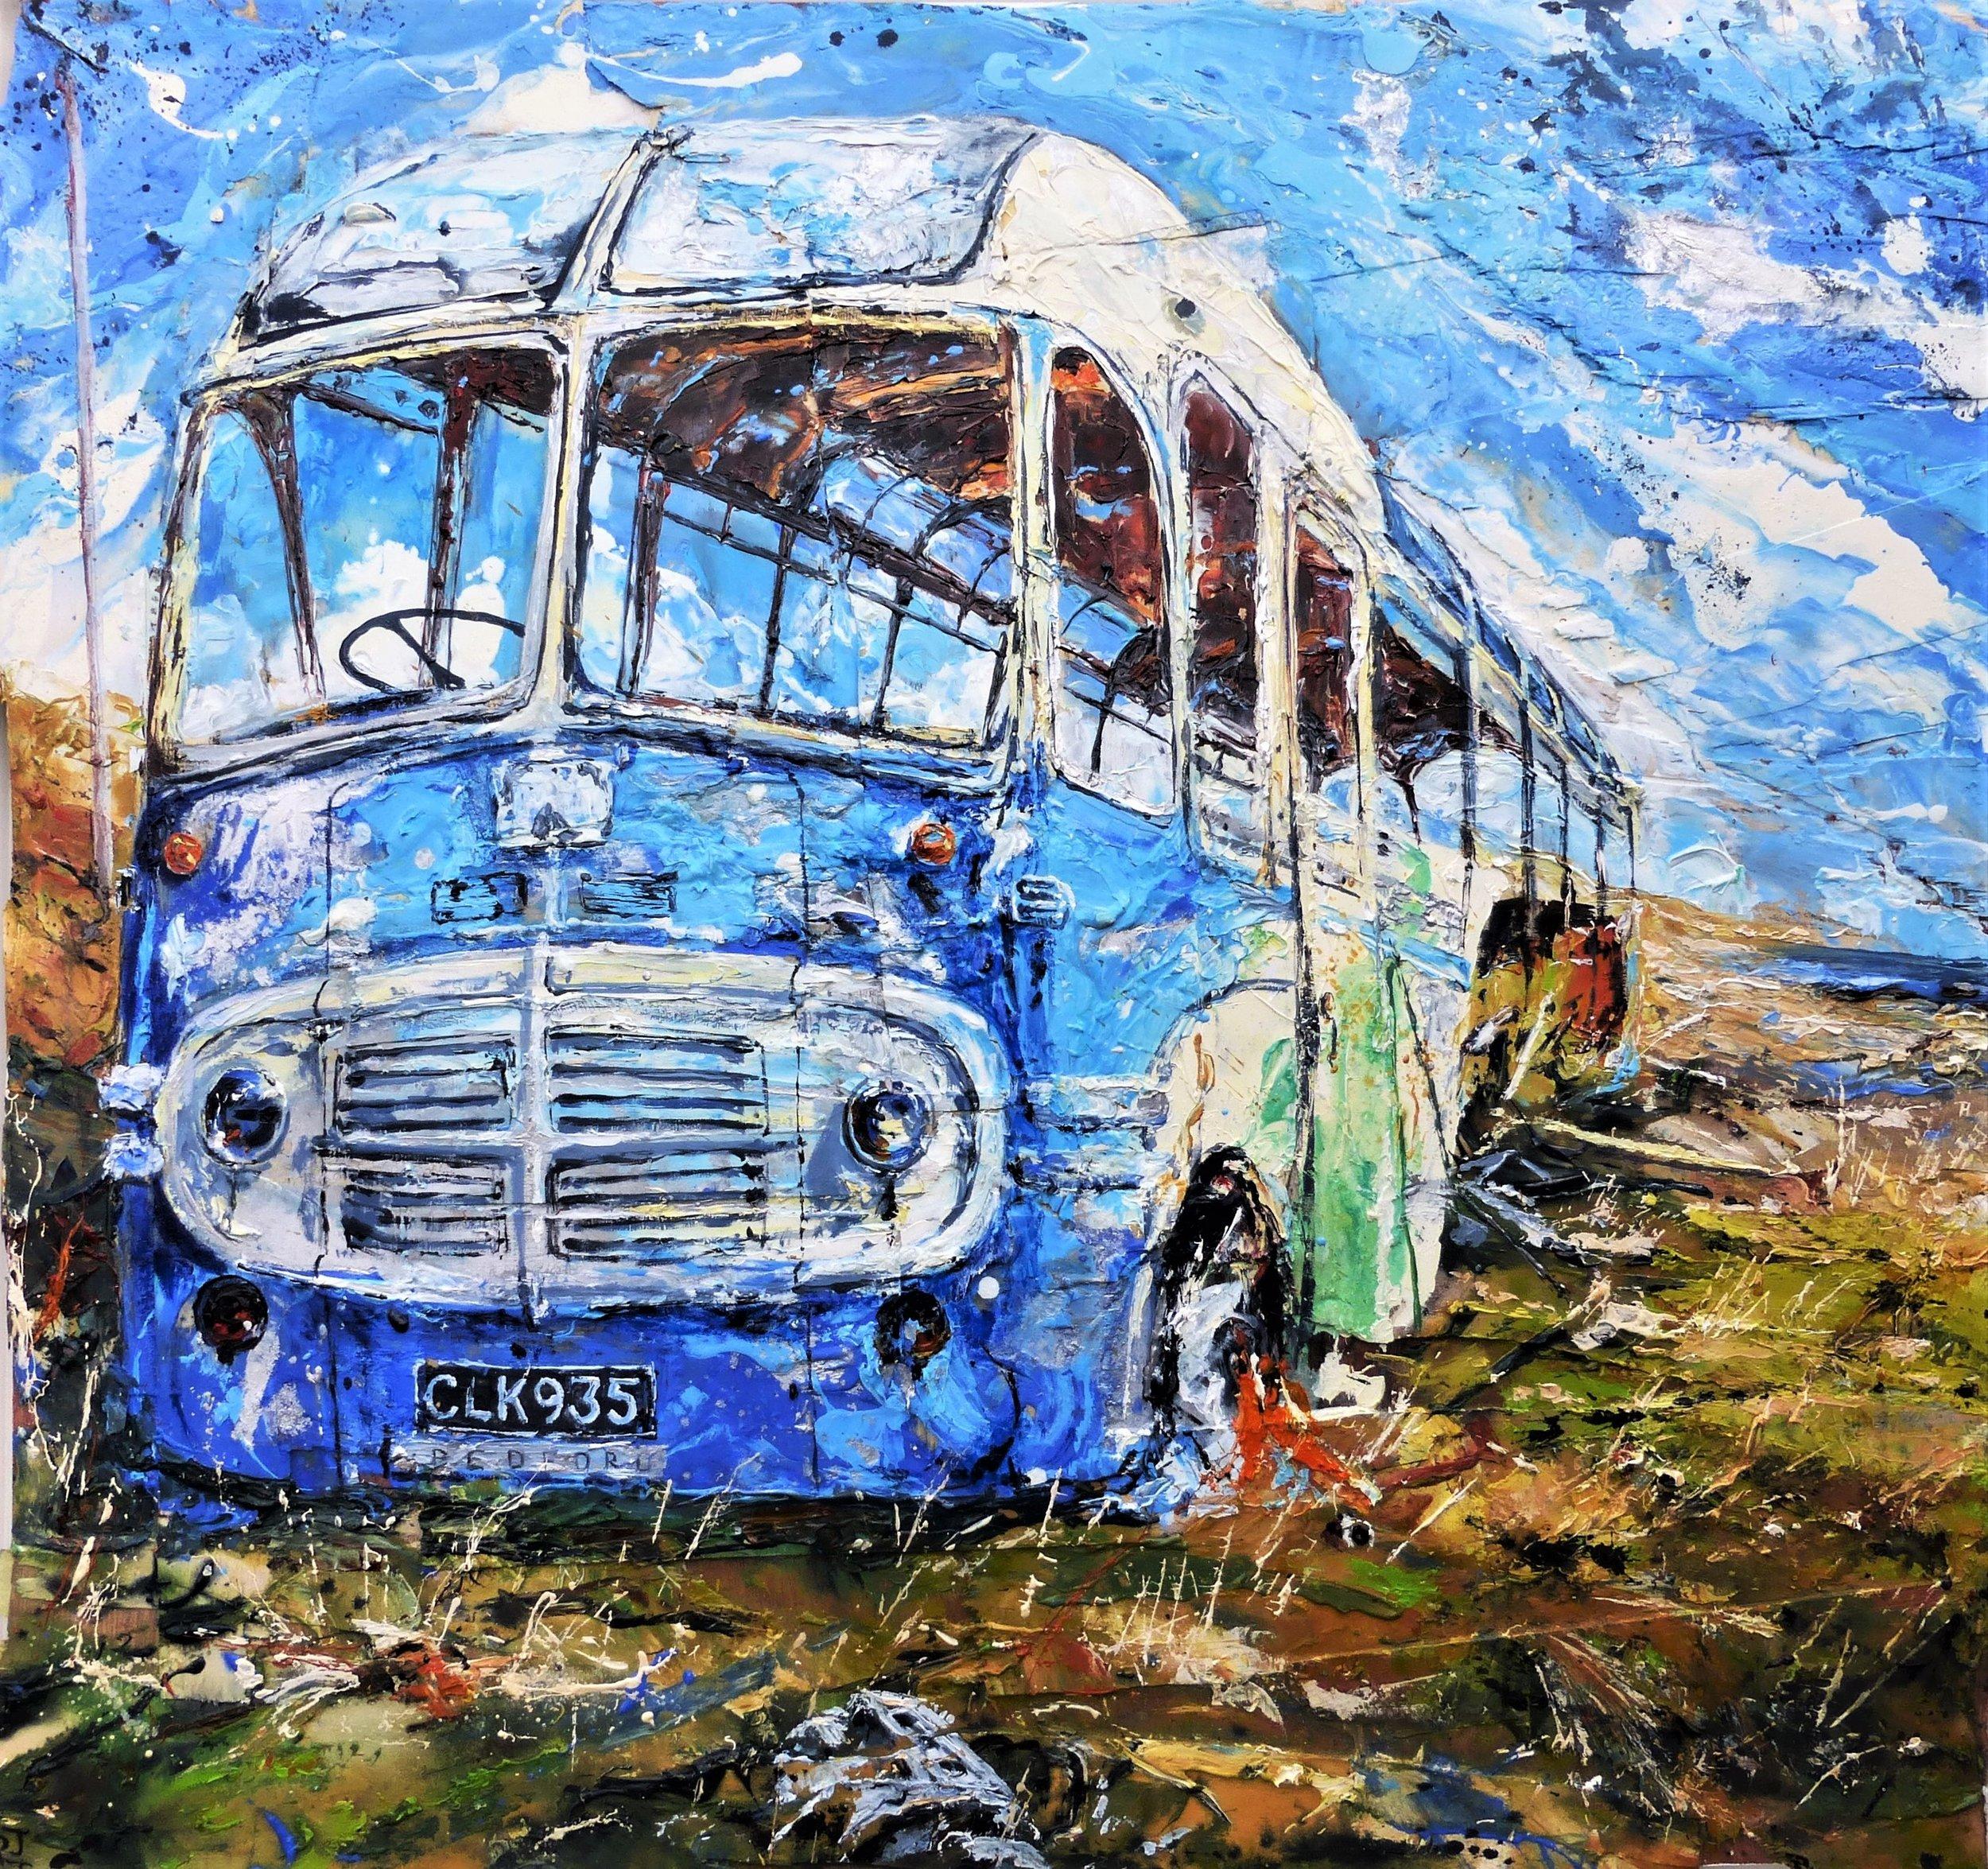 Abandoned Hoy Bus, Orkney Islands